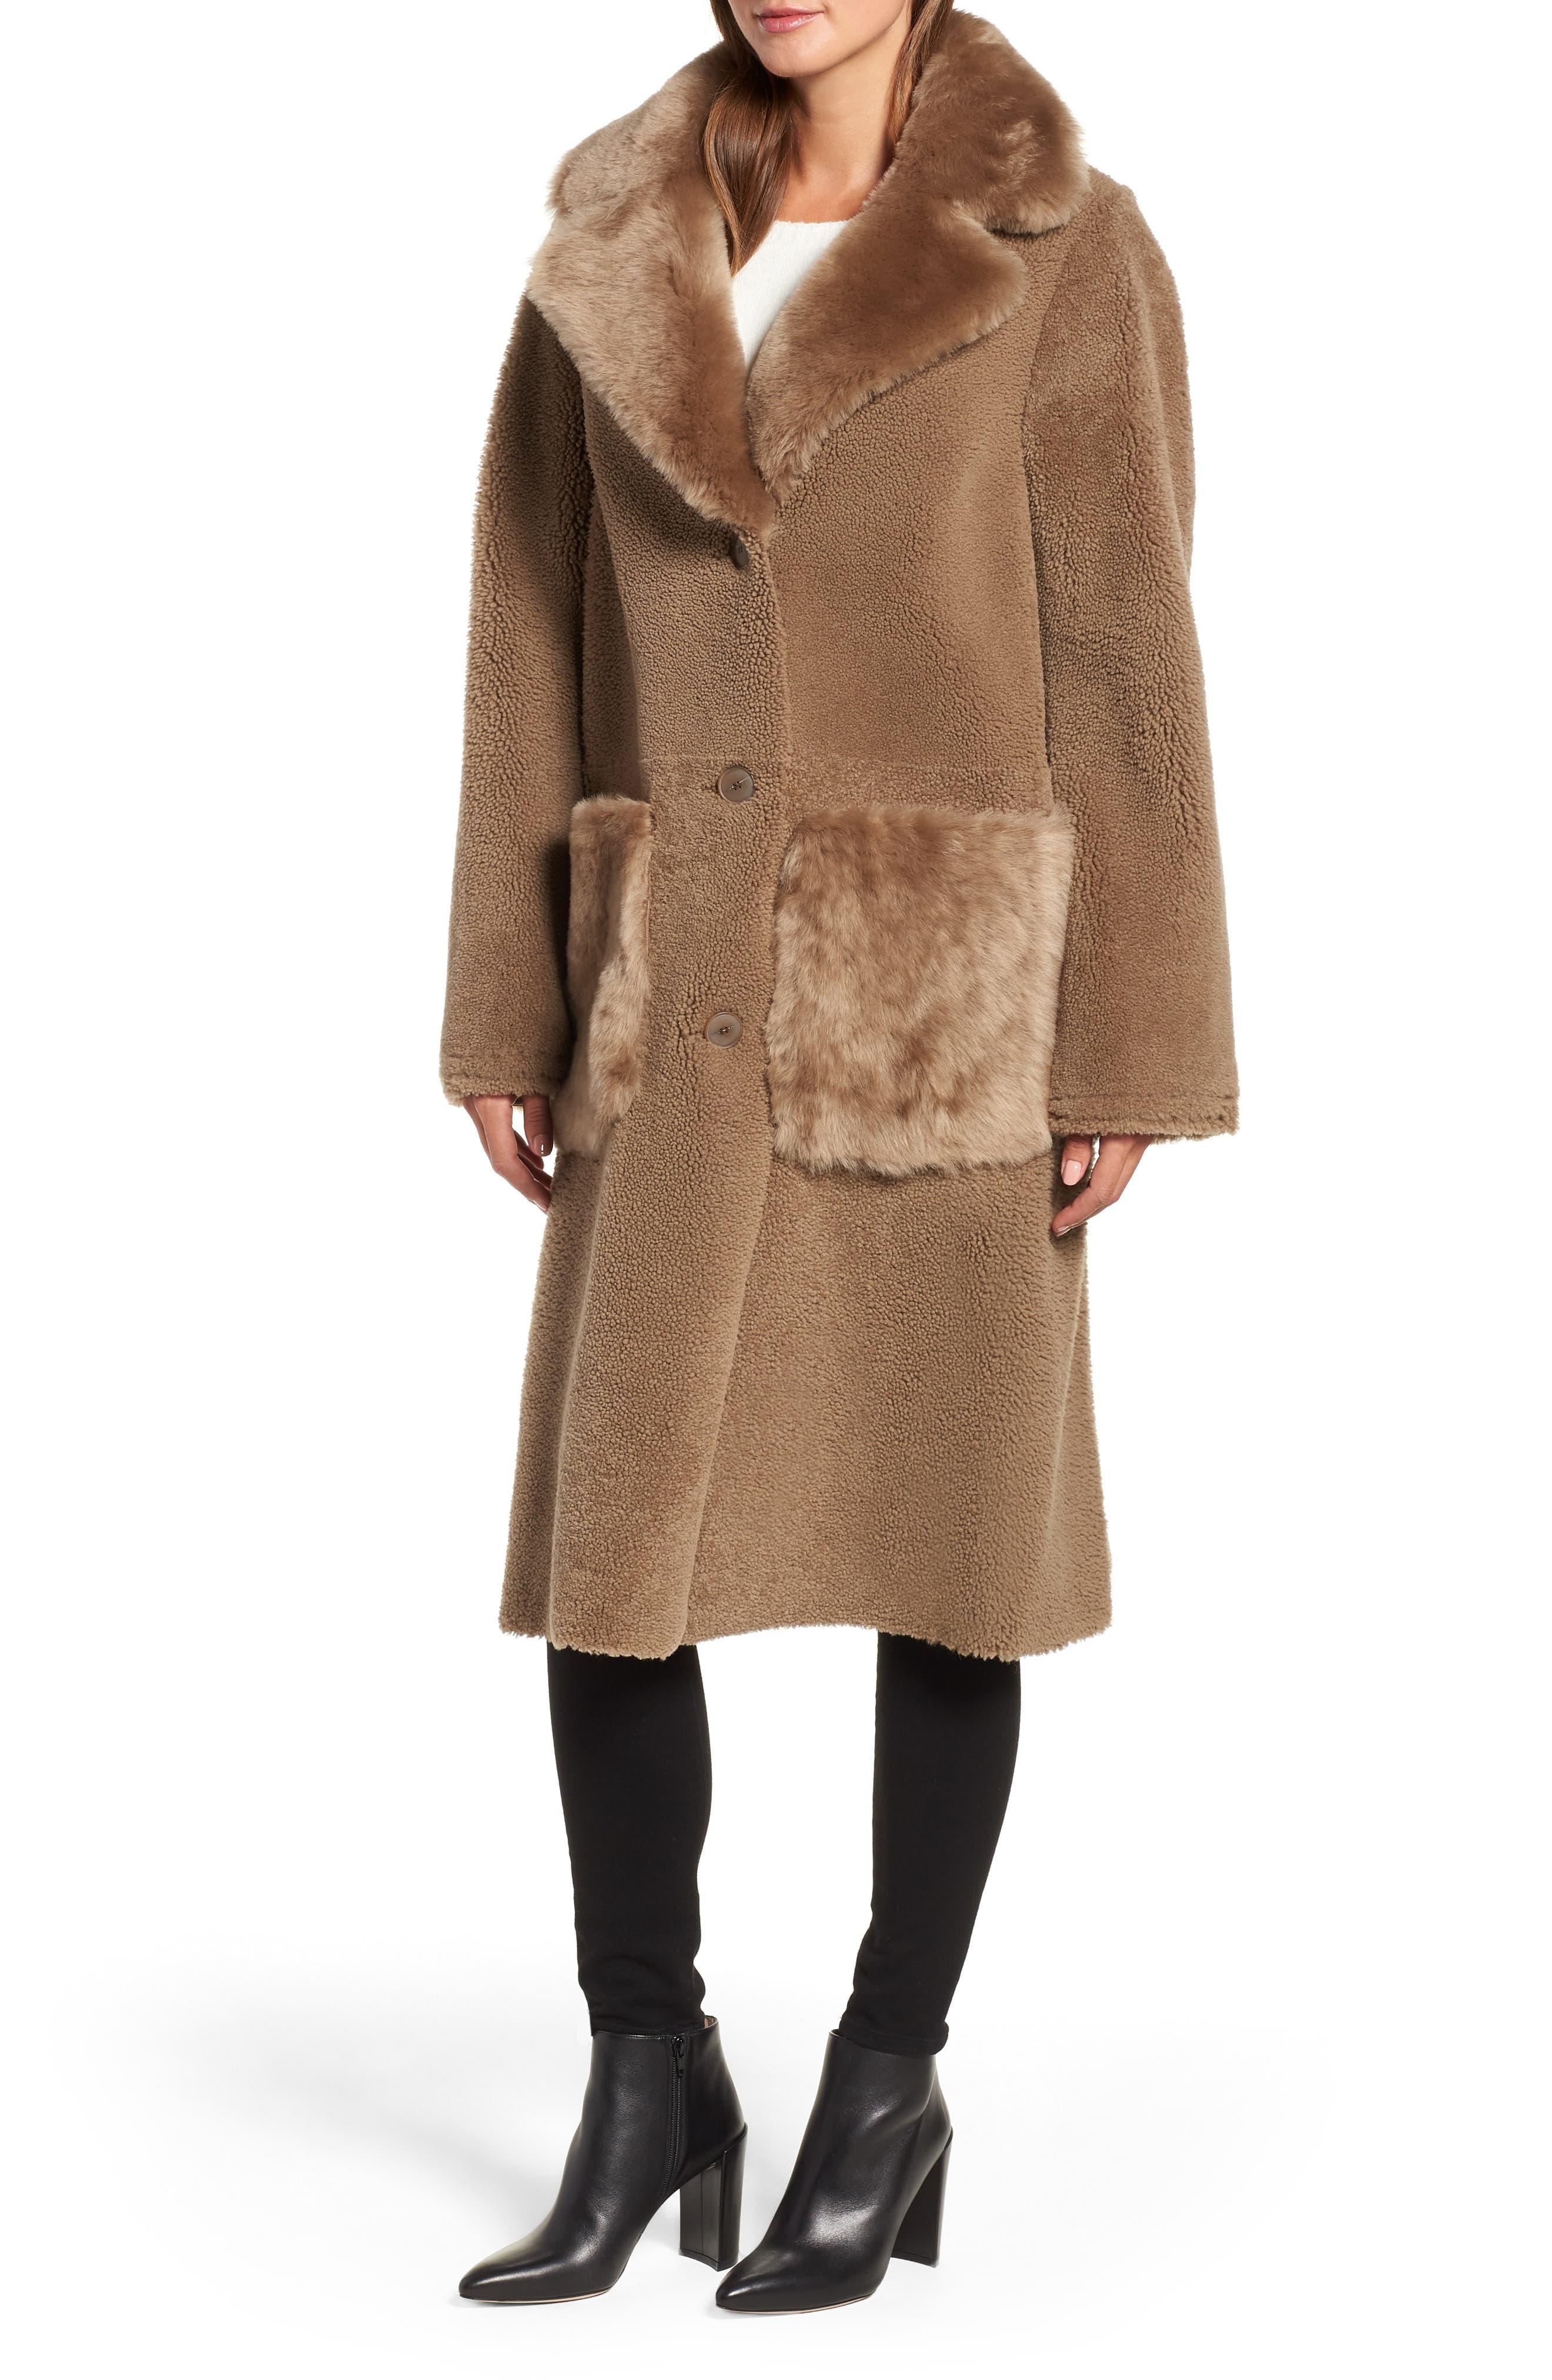 HISO,                             Genuine Merino Shearling Coat,                             Alternate thumbnail 4, color,                             250